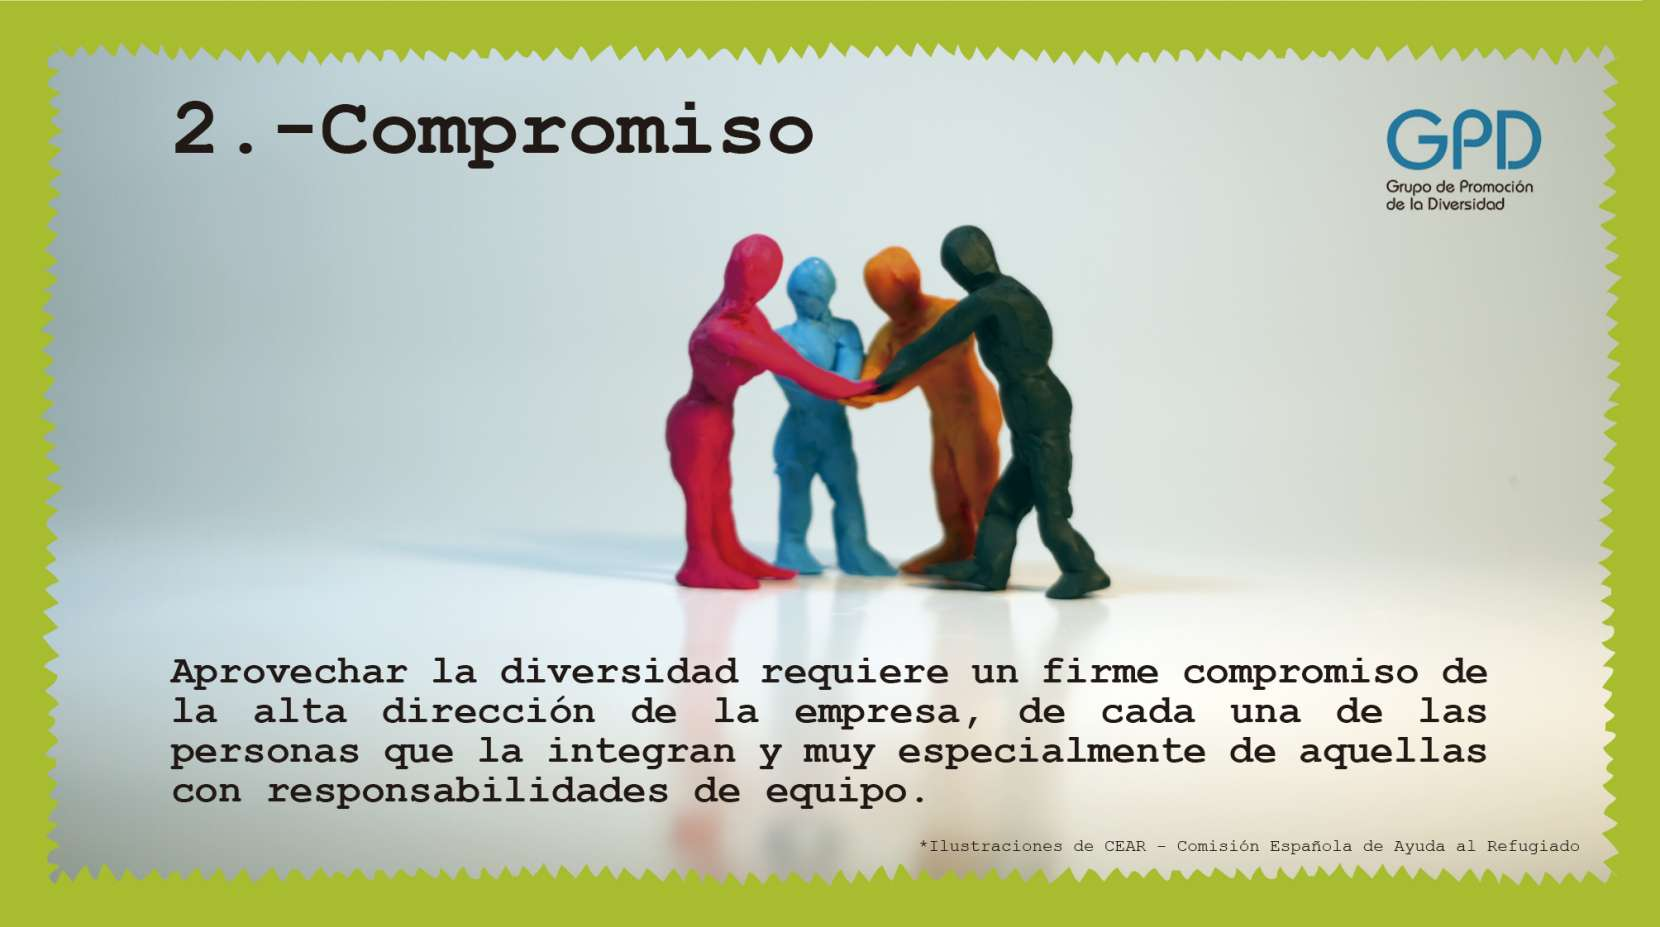 decalogo_con_logo_leyenda-04-1660x927.jpg